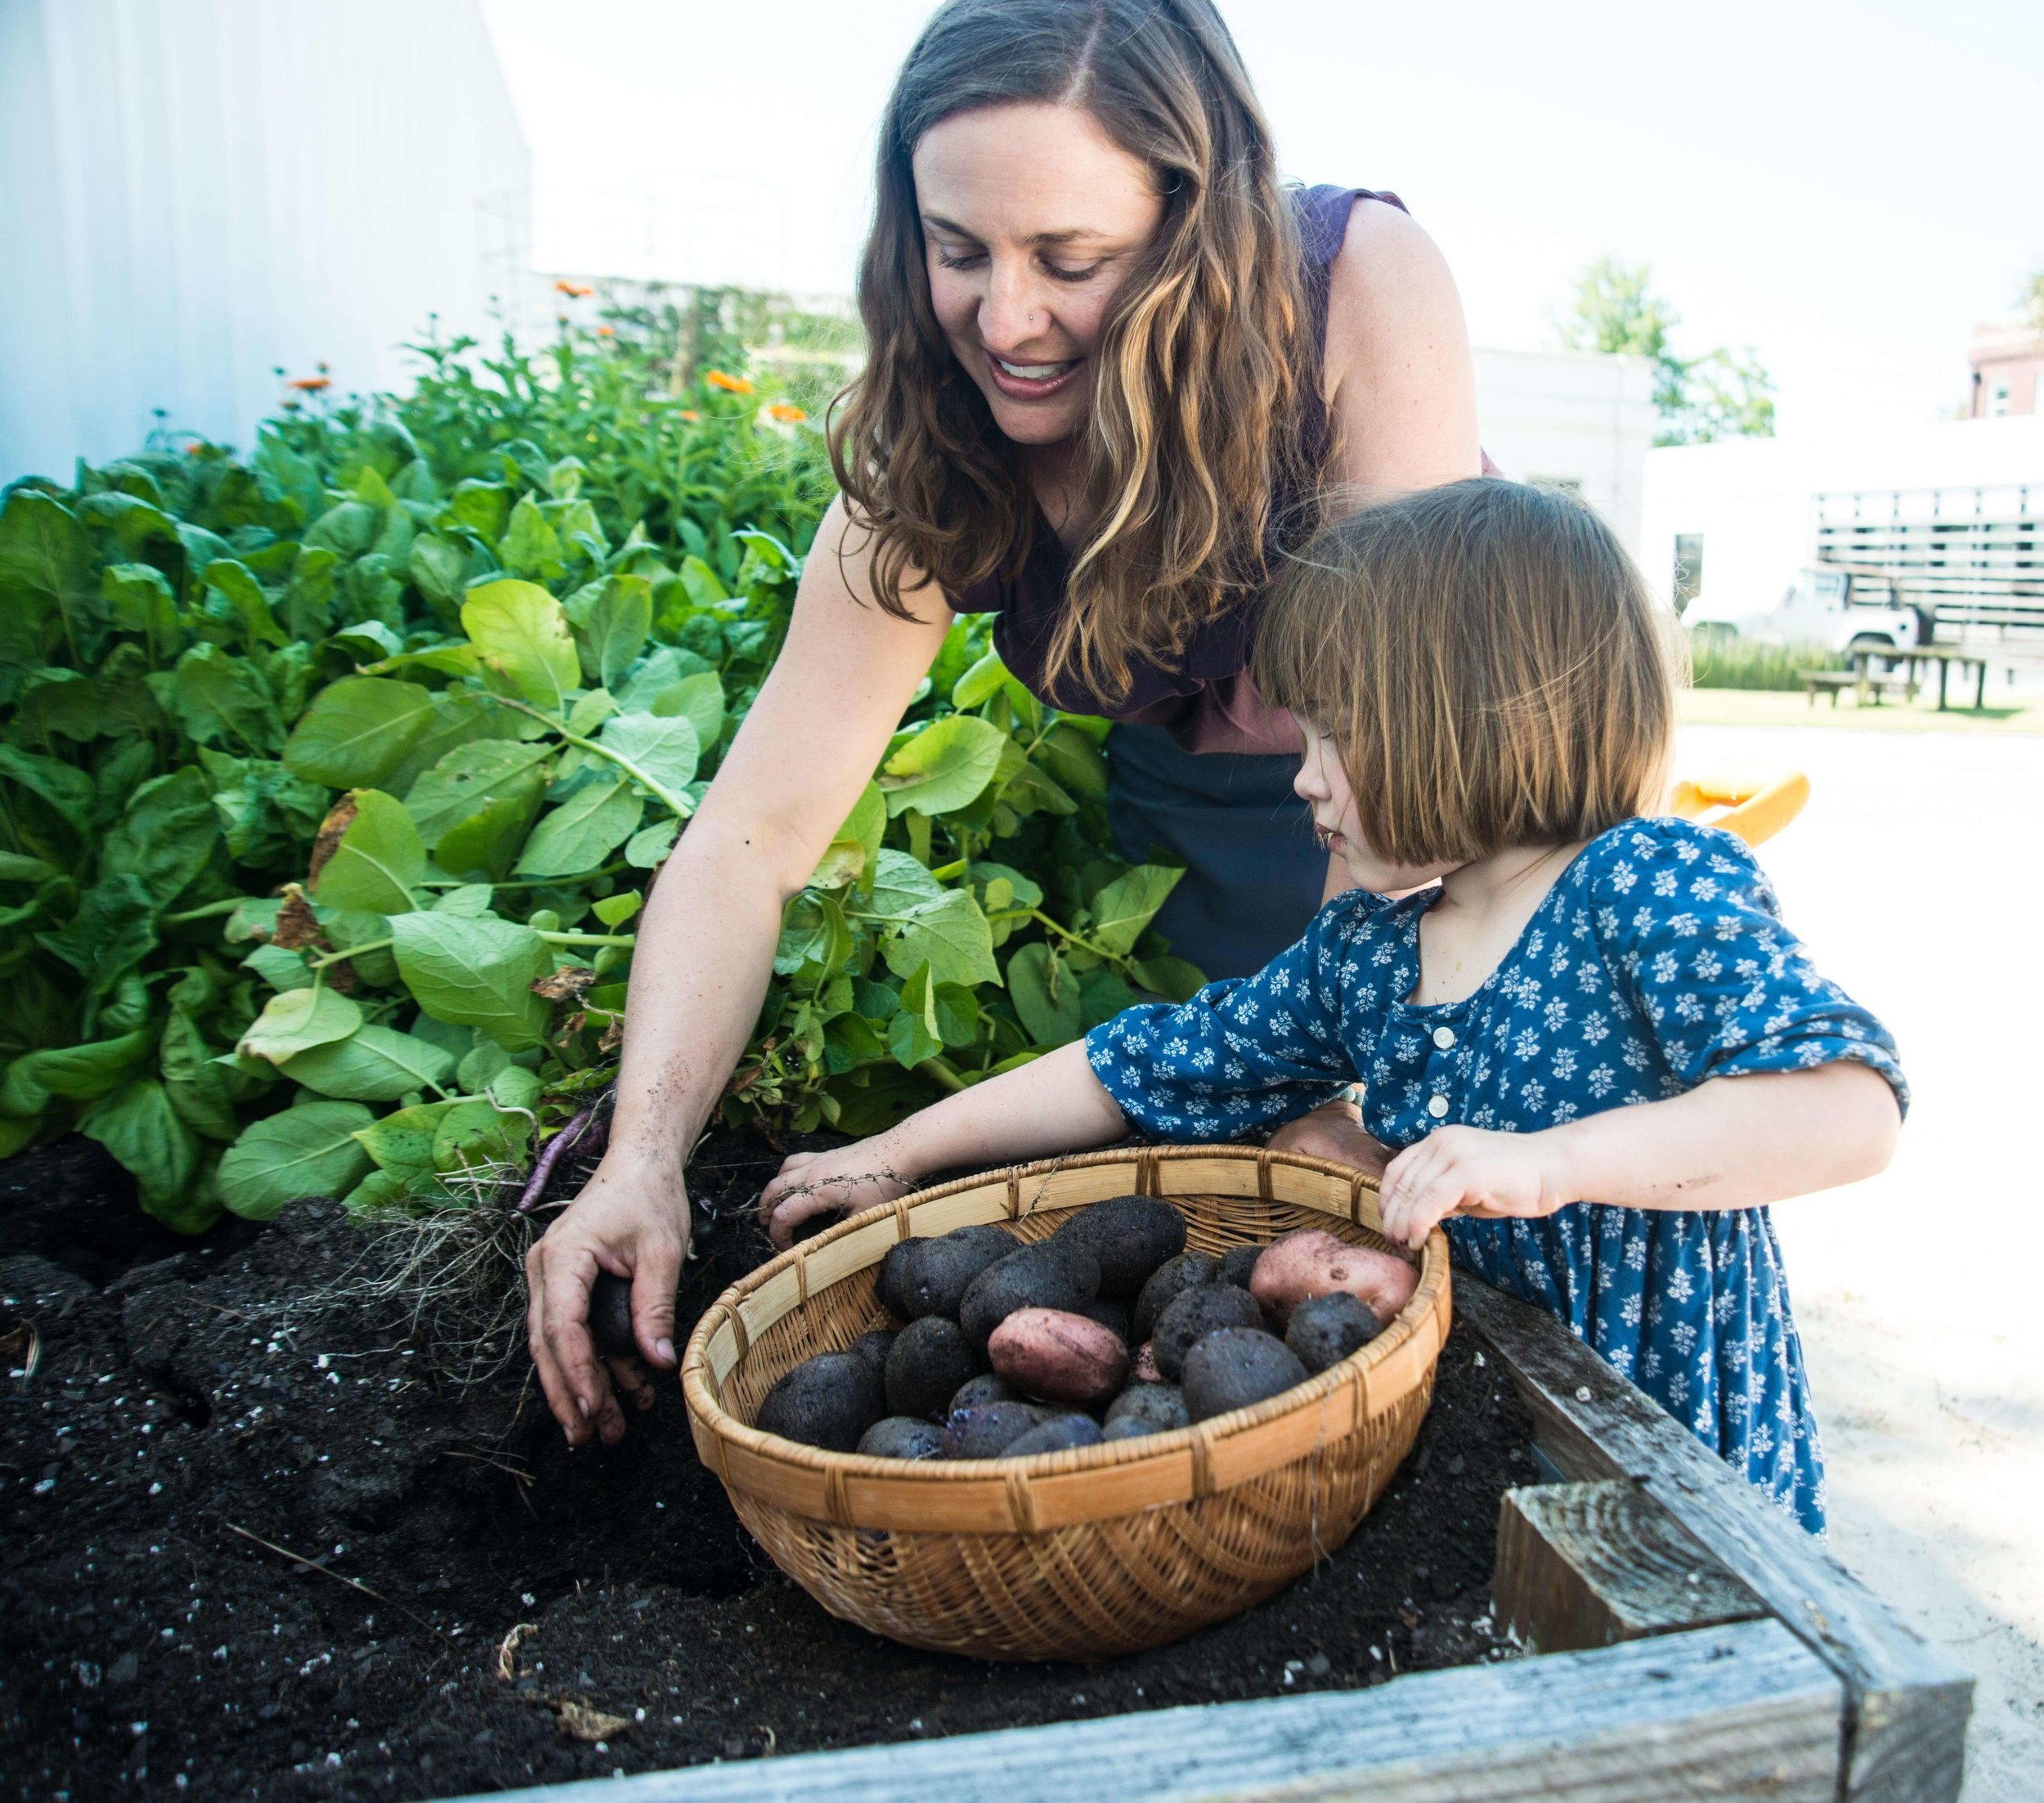 charleston-hatch-tribe-female-women-entrepreneurs-business-members-circle-inspiration-gardening5.jpg